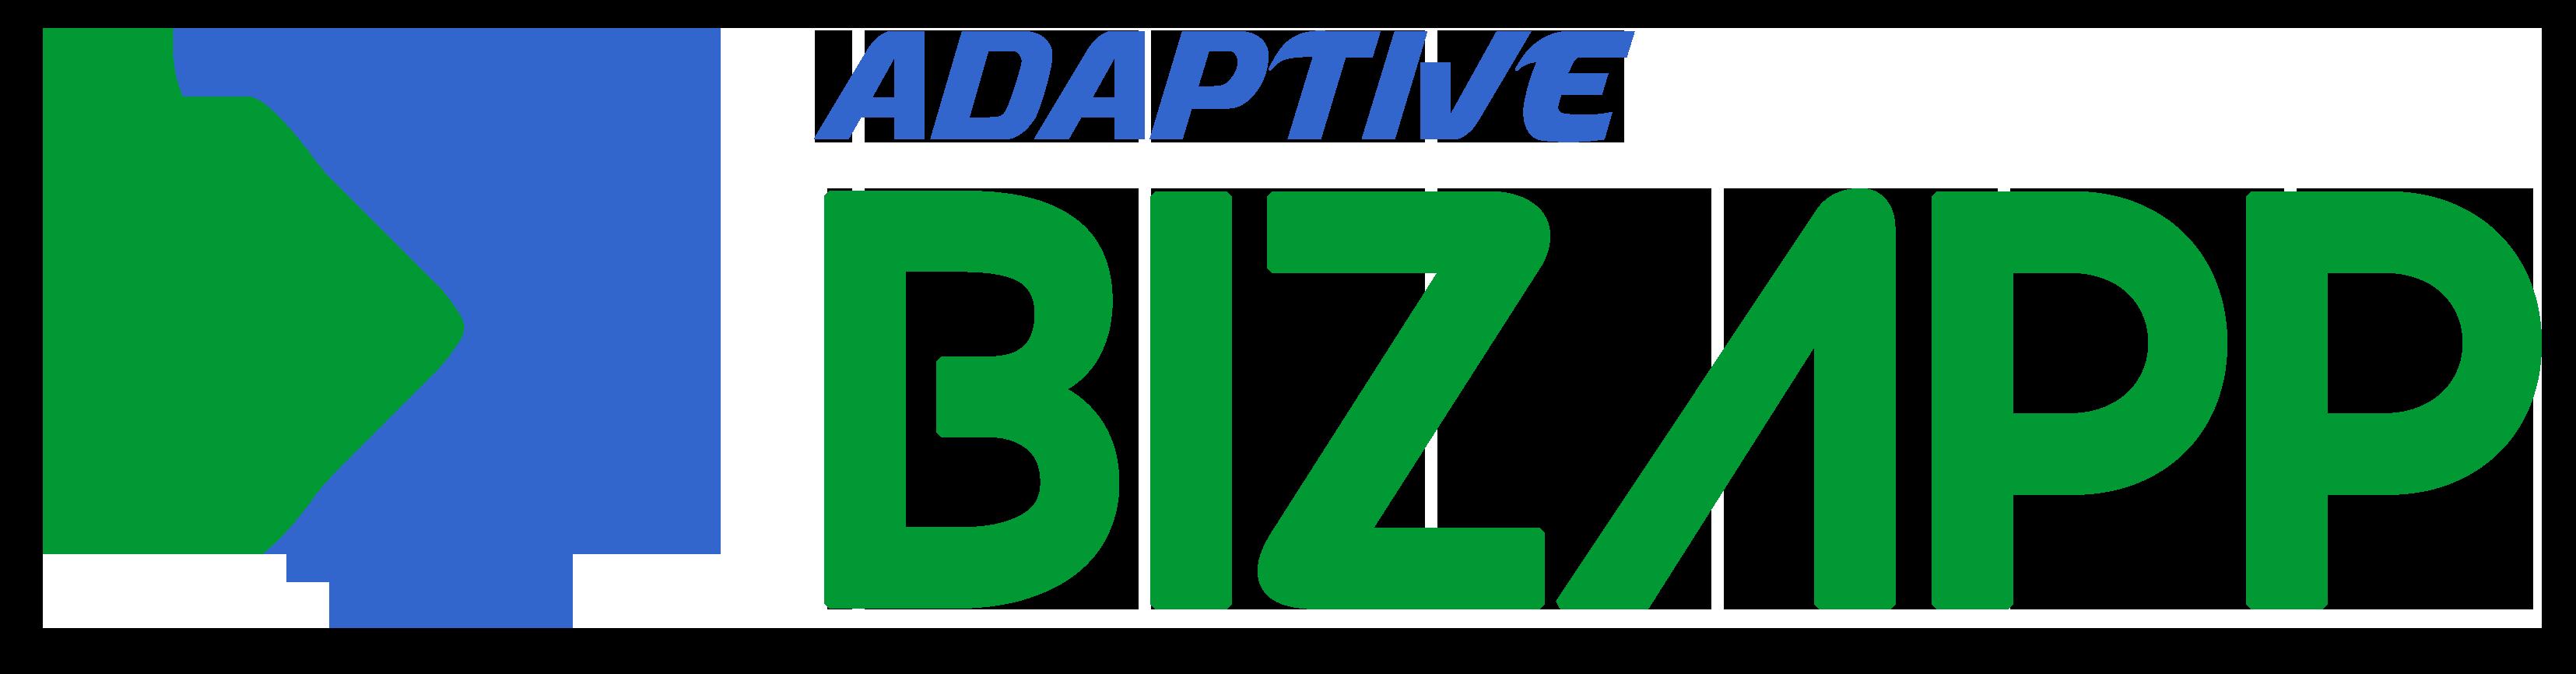 Adaptive Bizapp